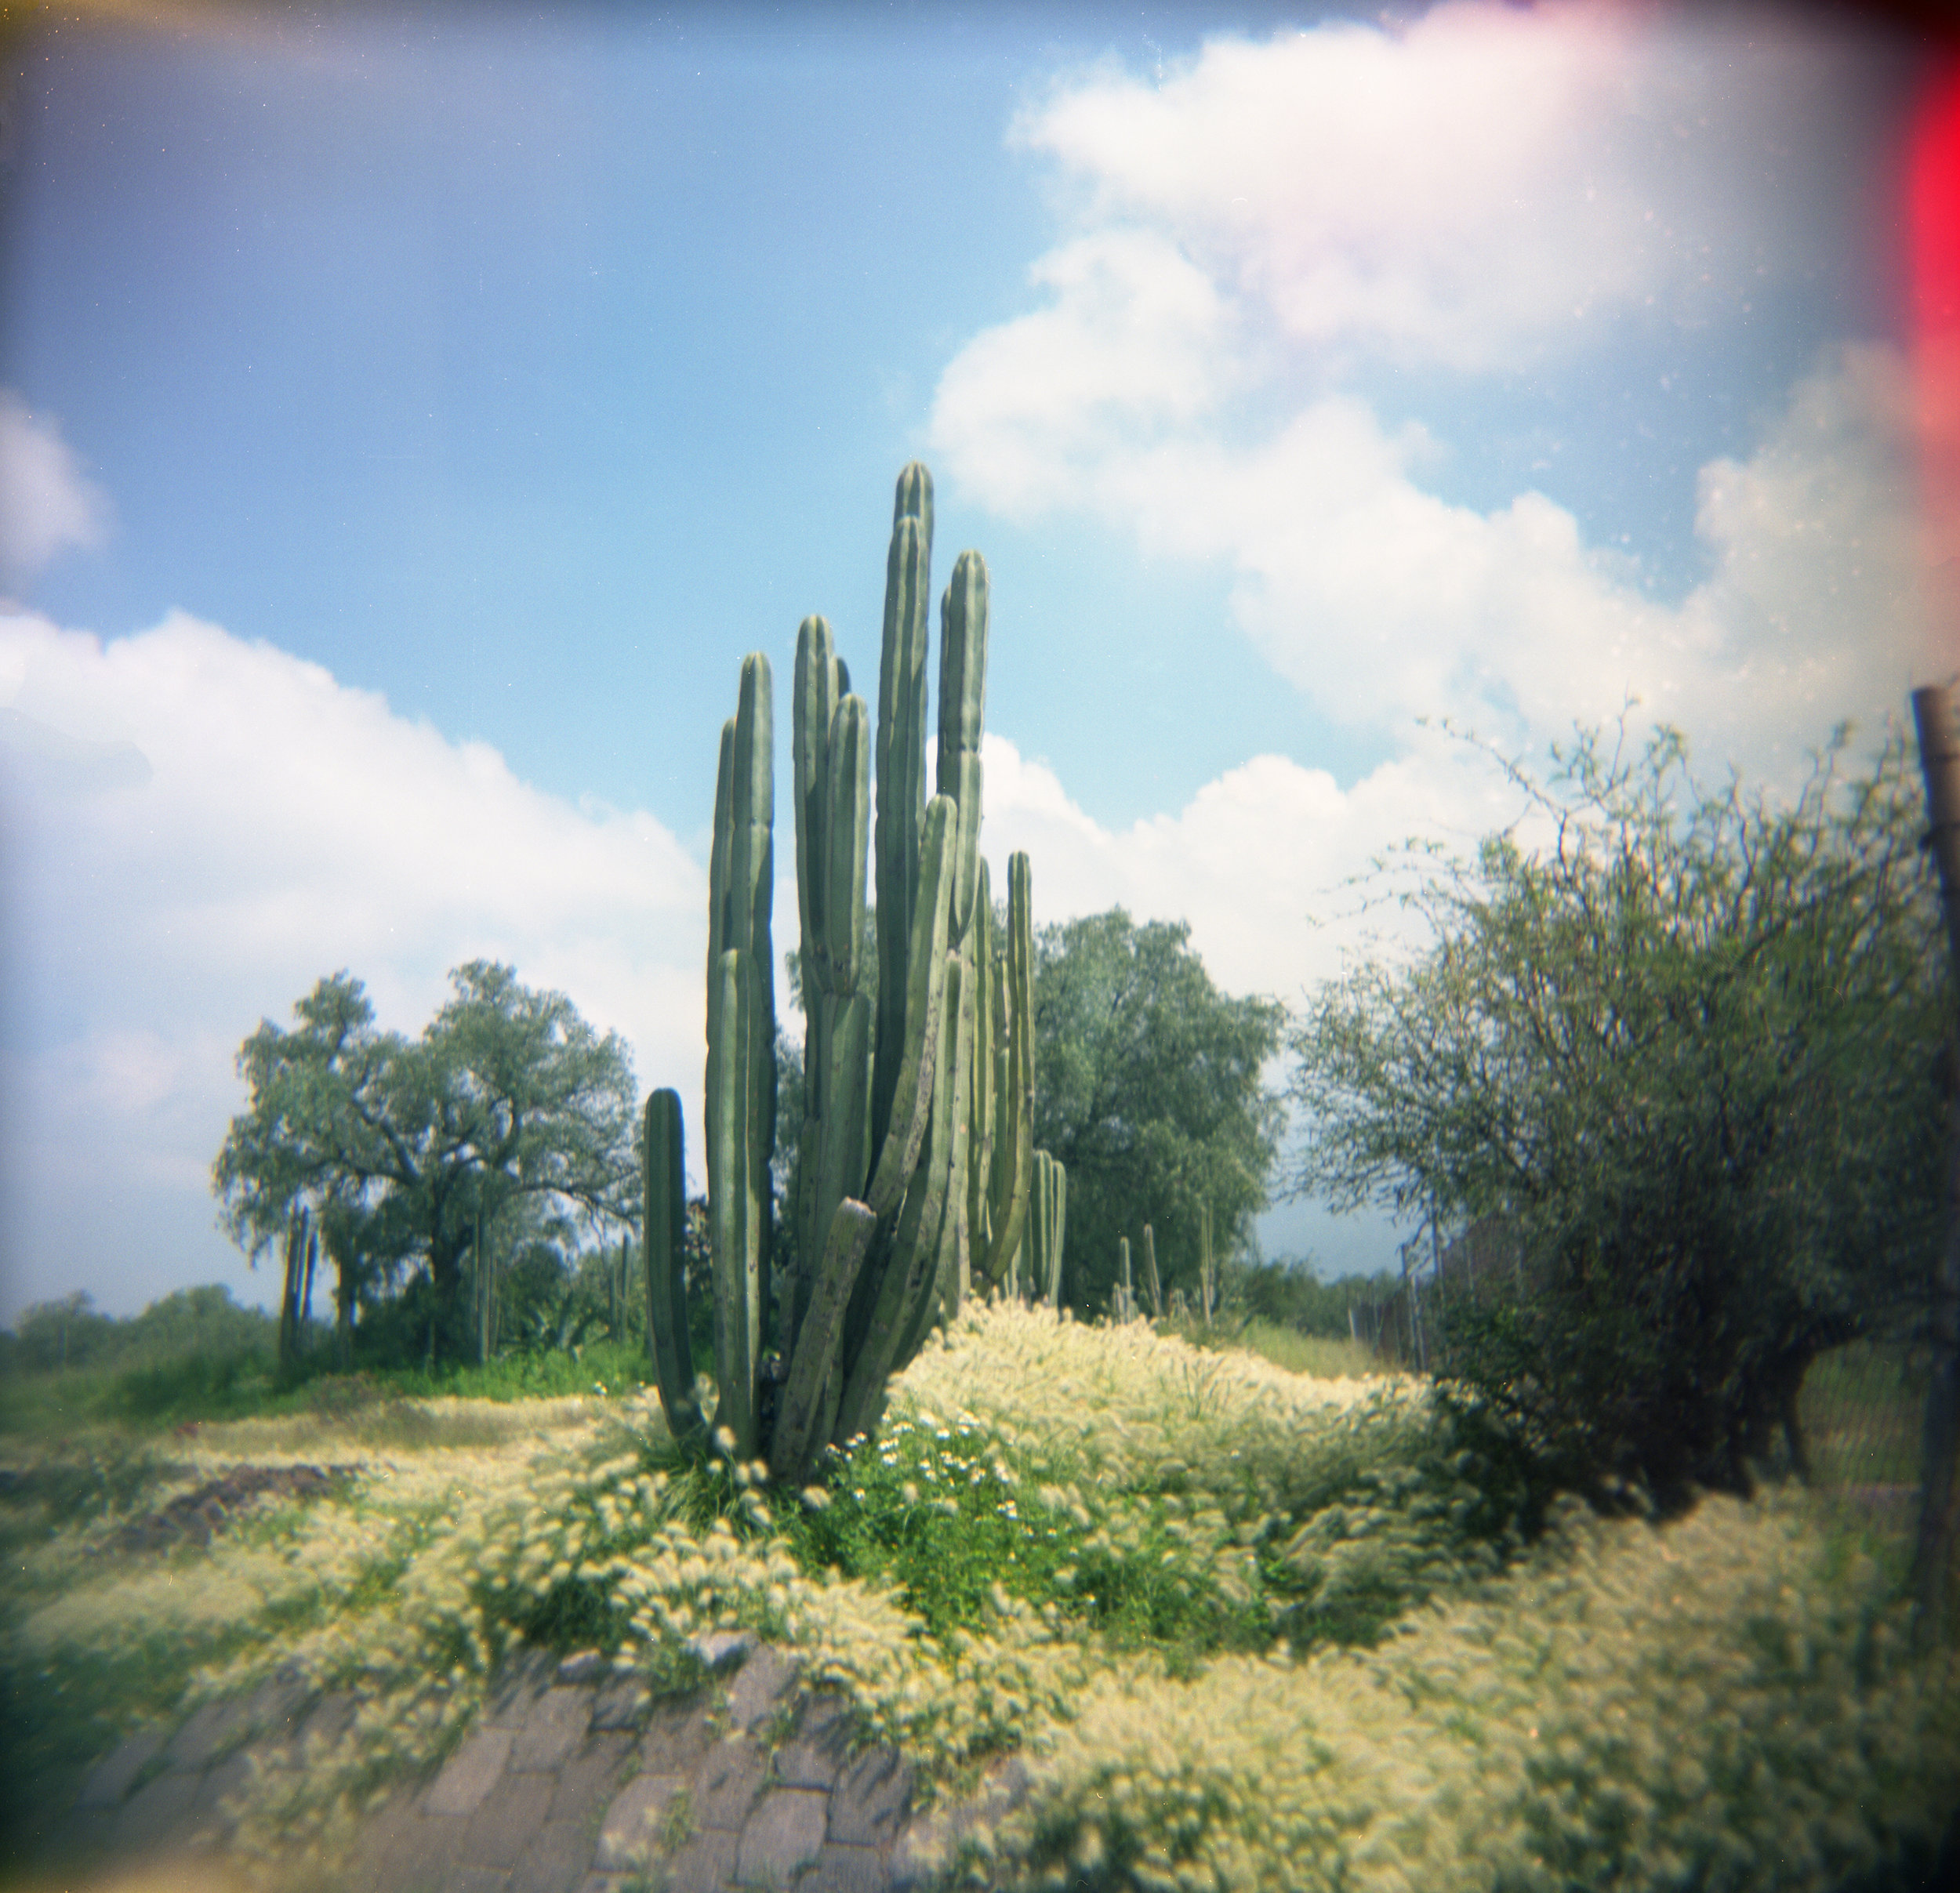 Wild Cactus, Teotihuacan